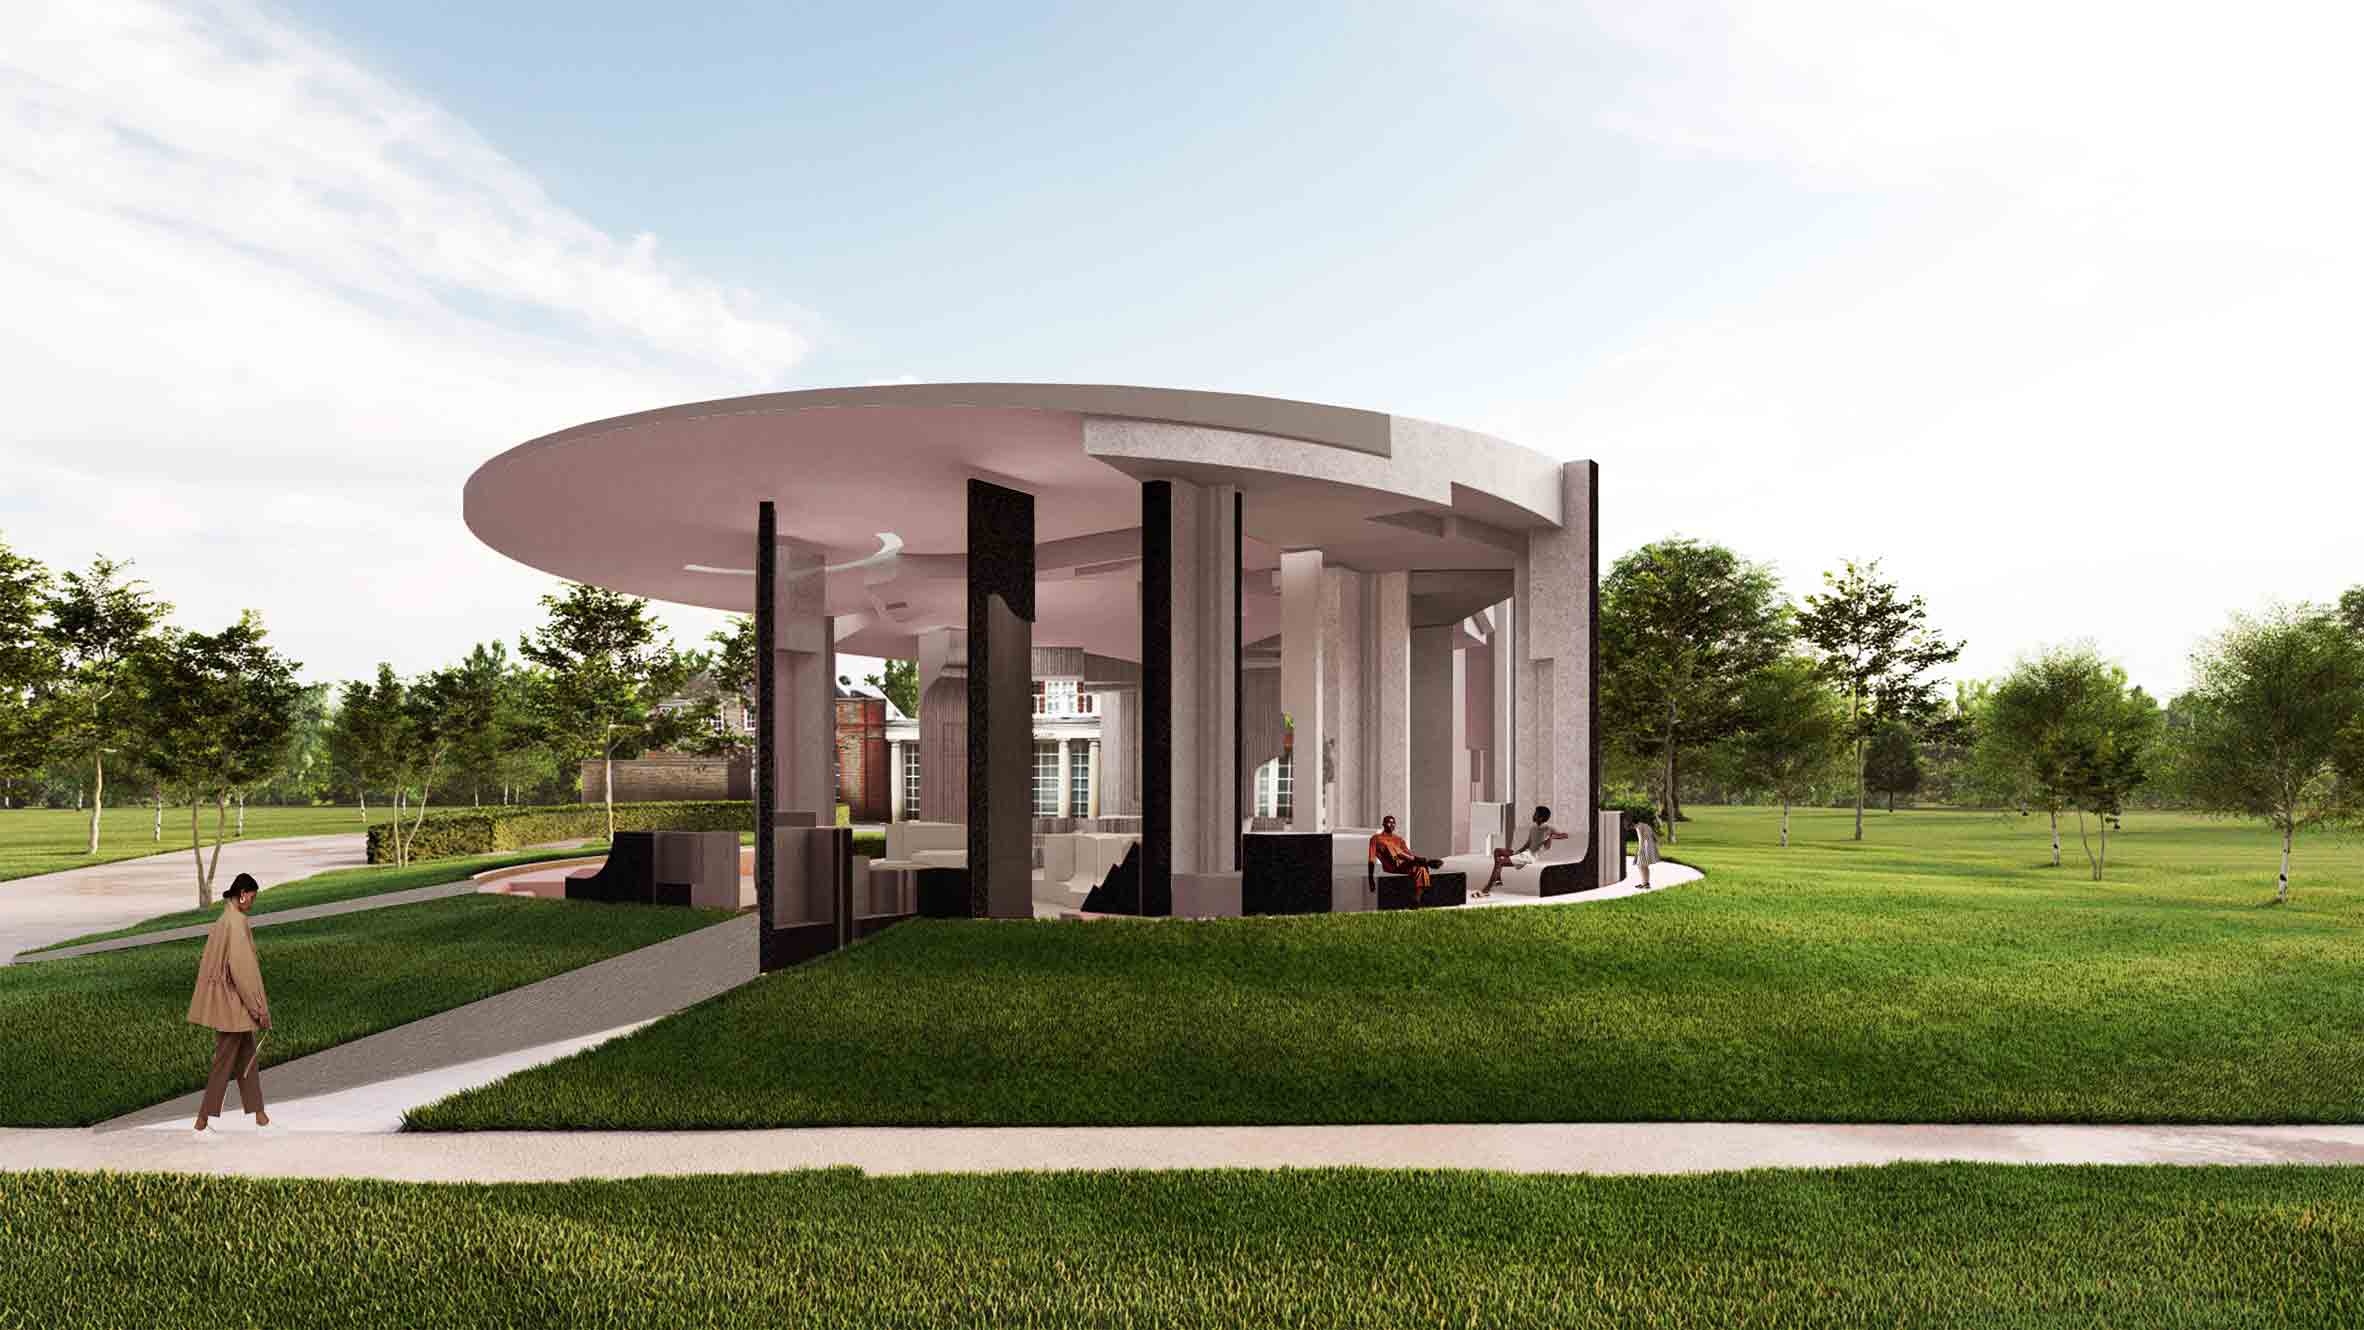 2021 Serpentine Pavilion